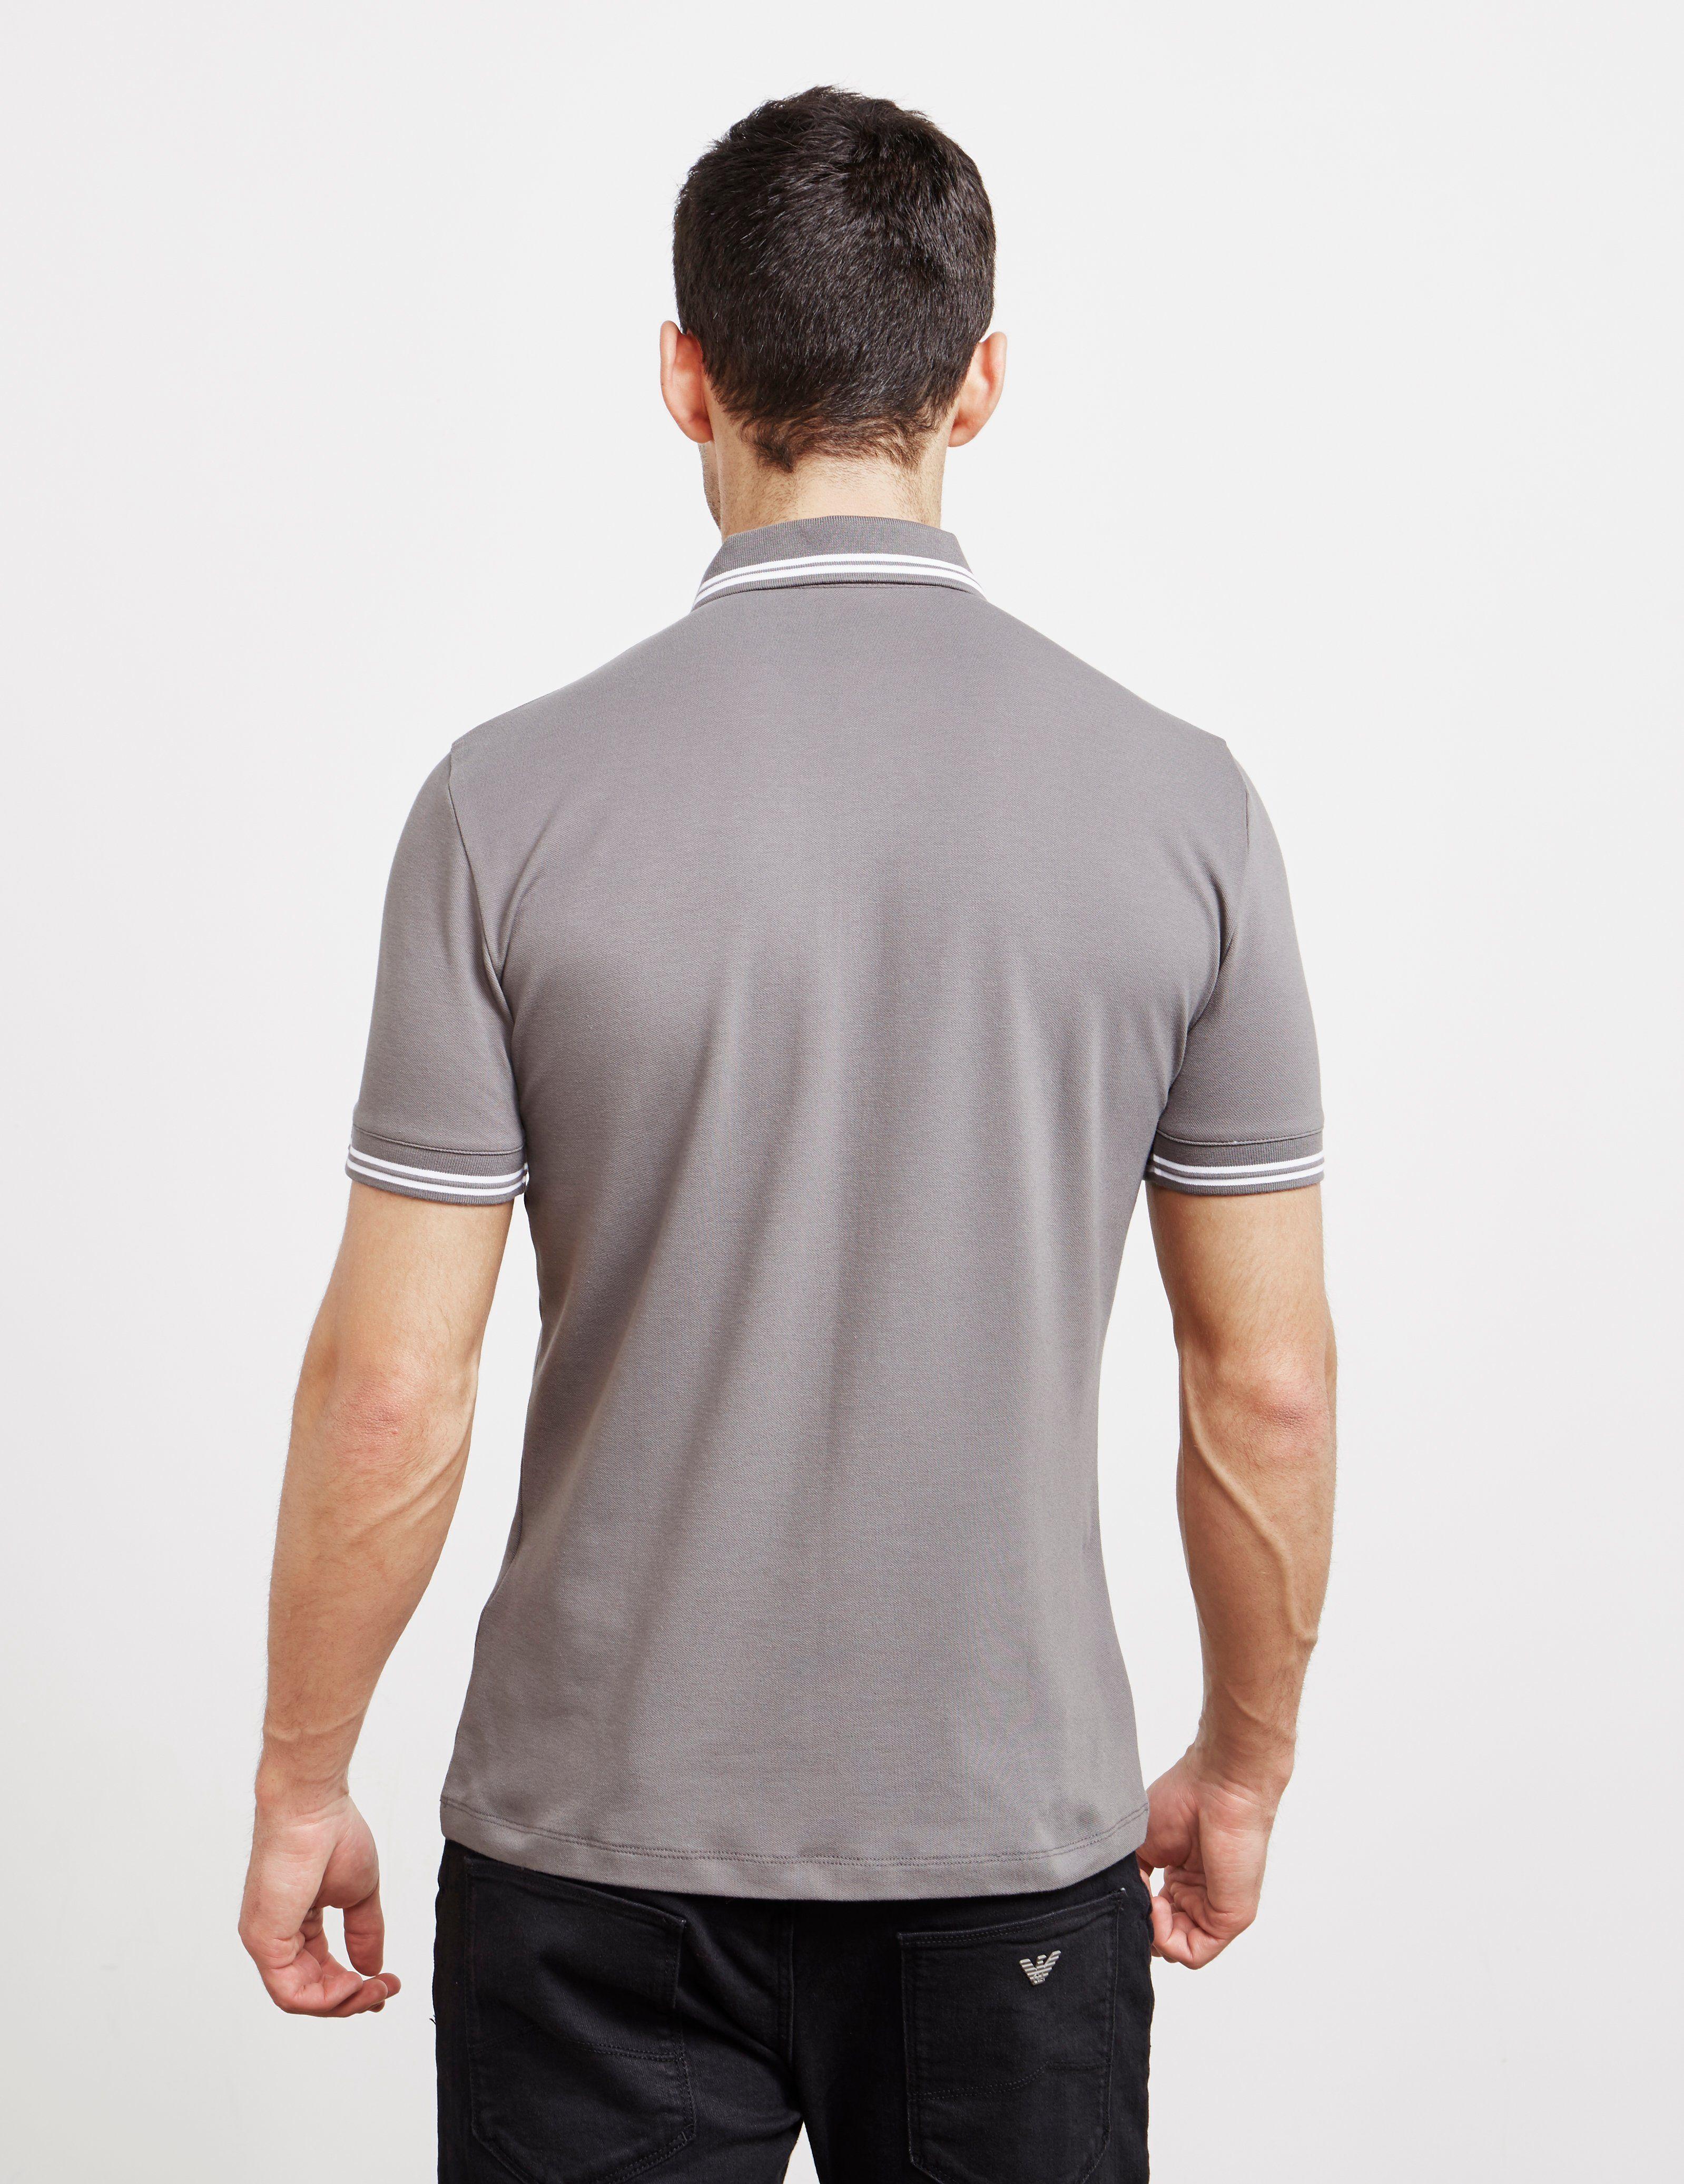 Emporio Armani Tipped Badge Short Sleeve Polo Shirt